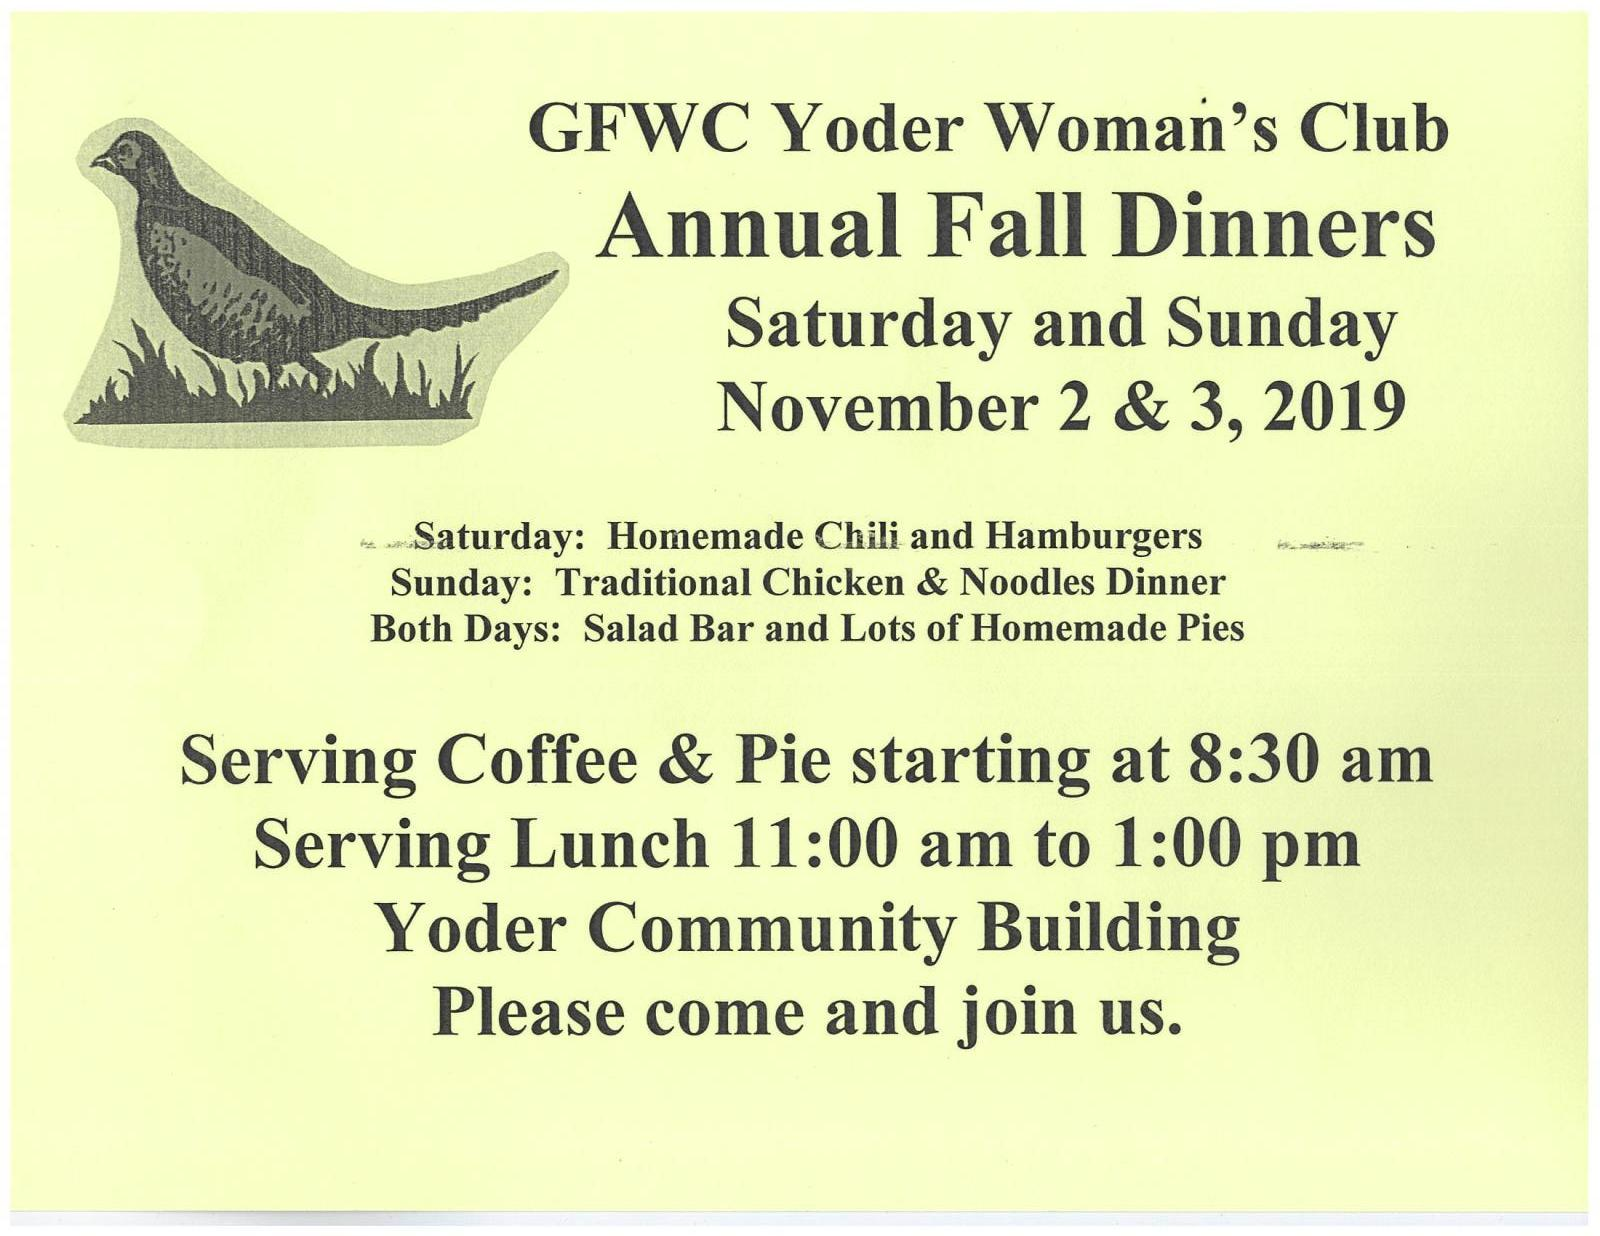 GFWC Yoder Woman's Club Annual Fall Dinners Photo